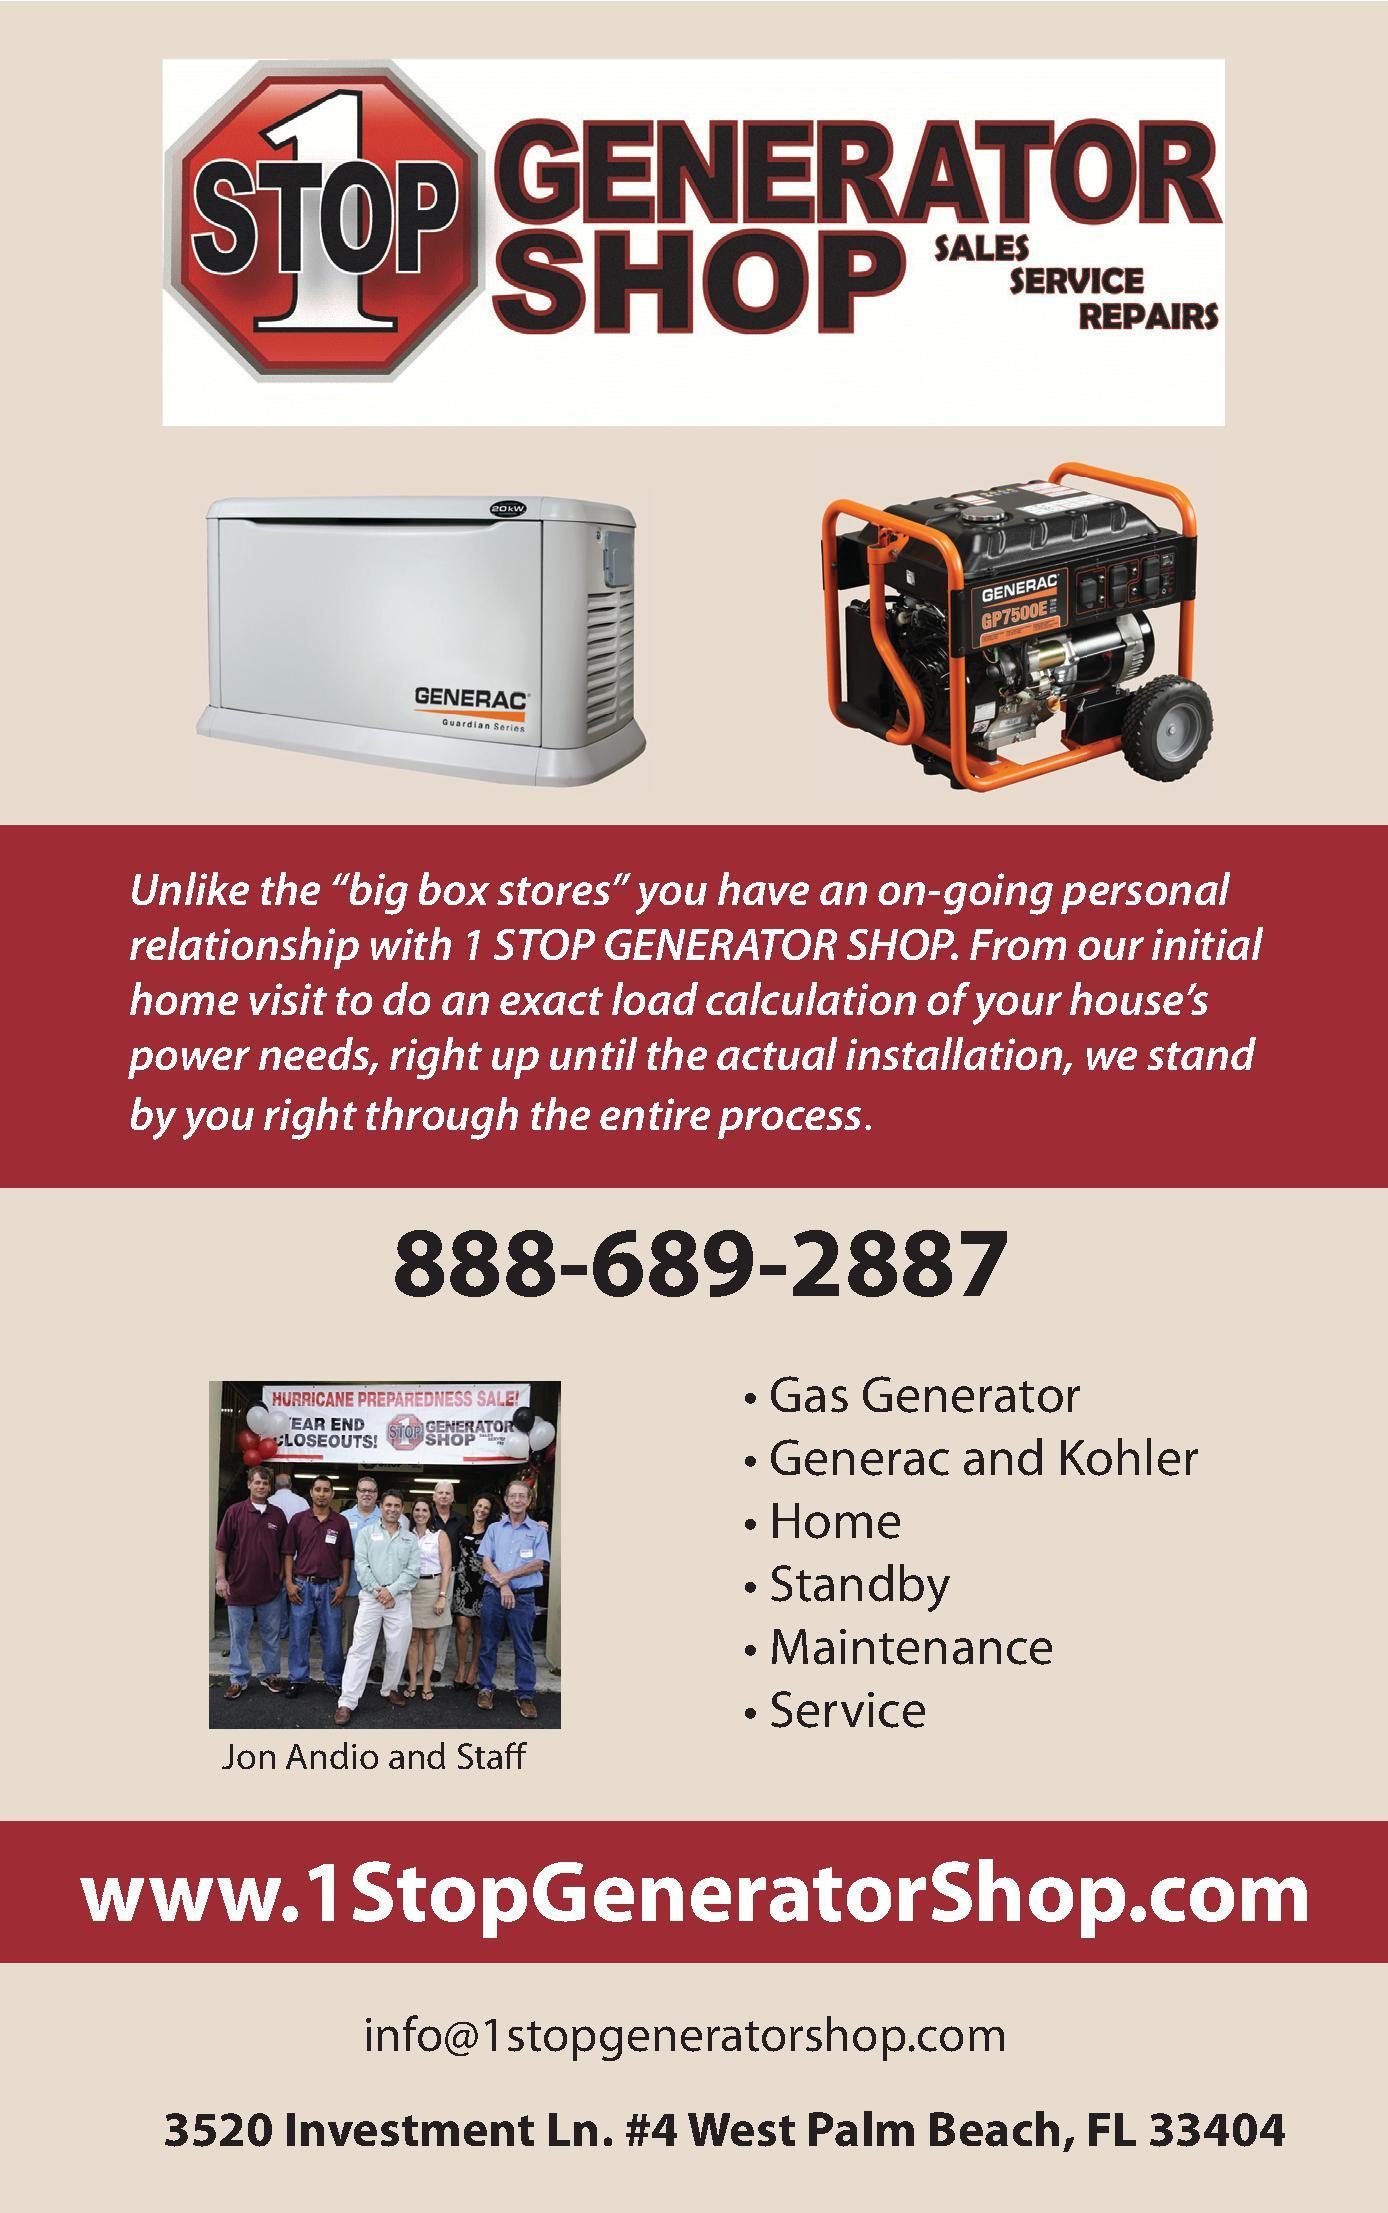 1 Stop Generator Shop